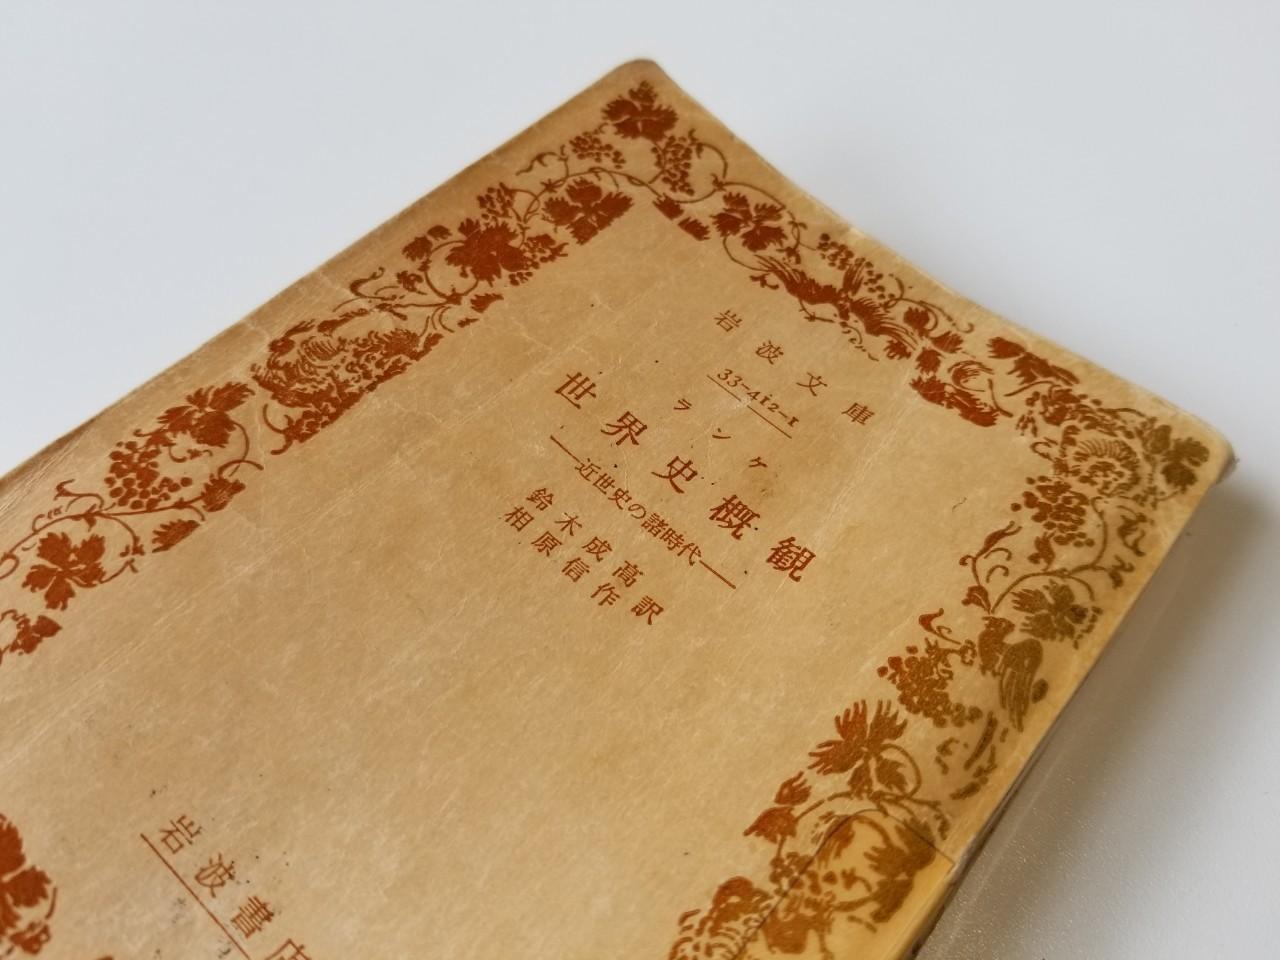 vol.65「マンツーマンの効用」(...